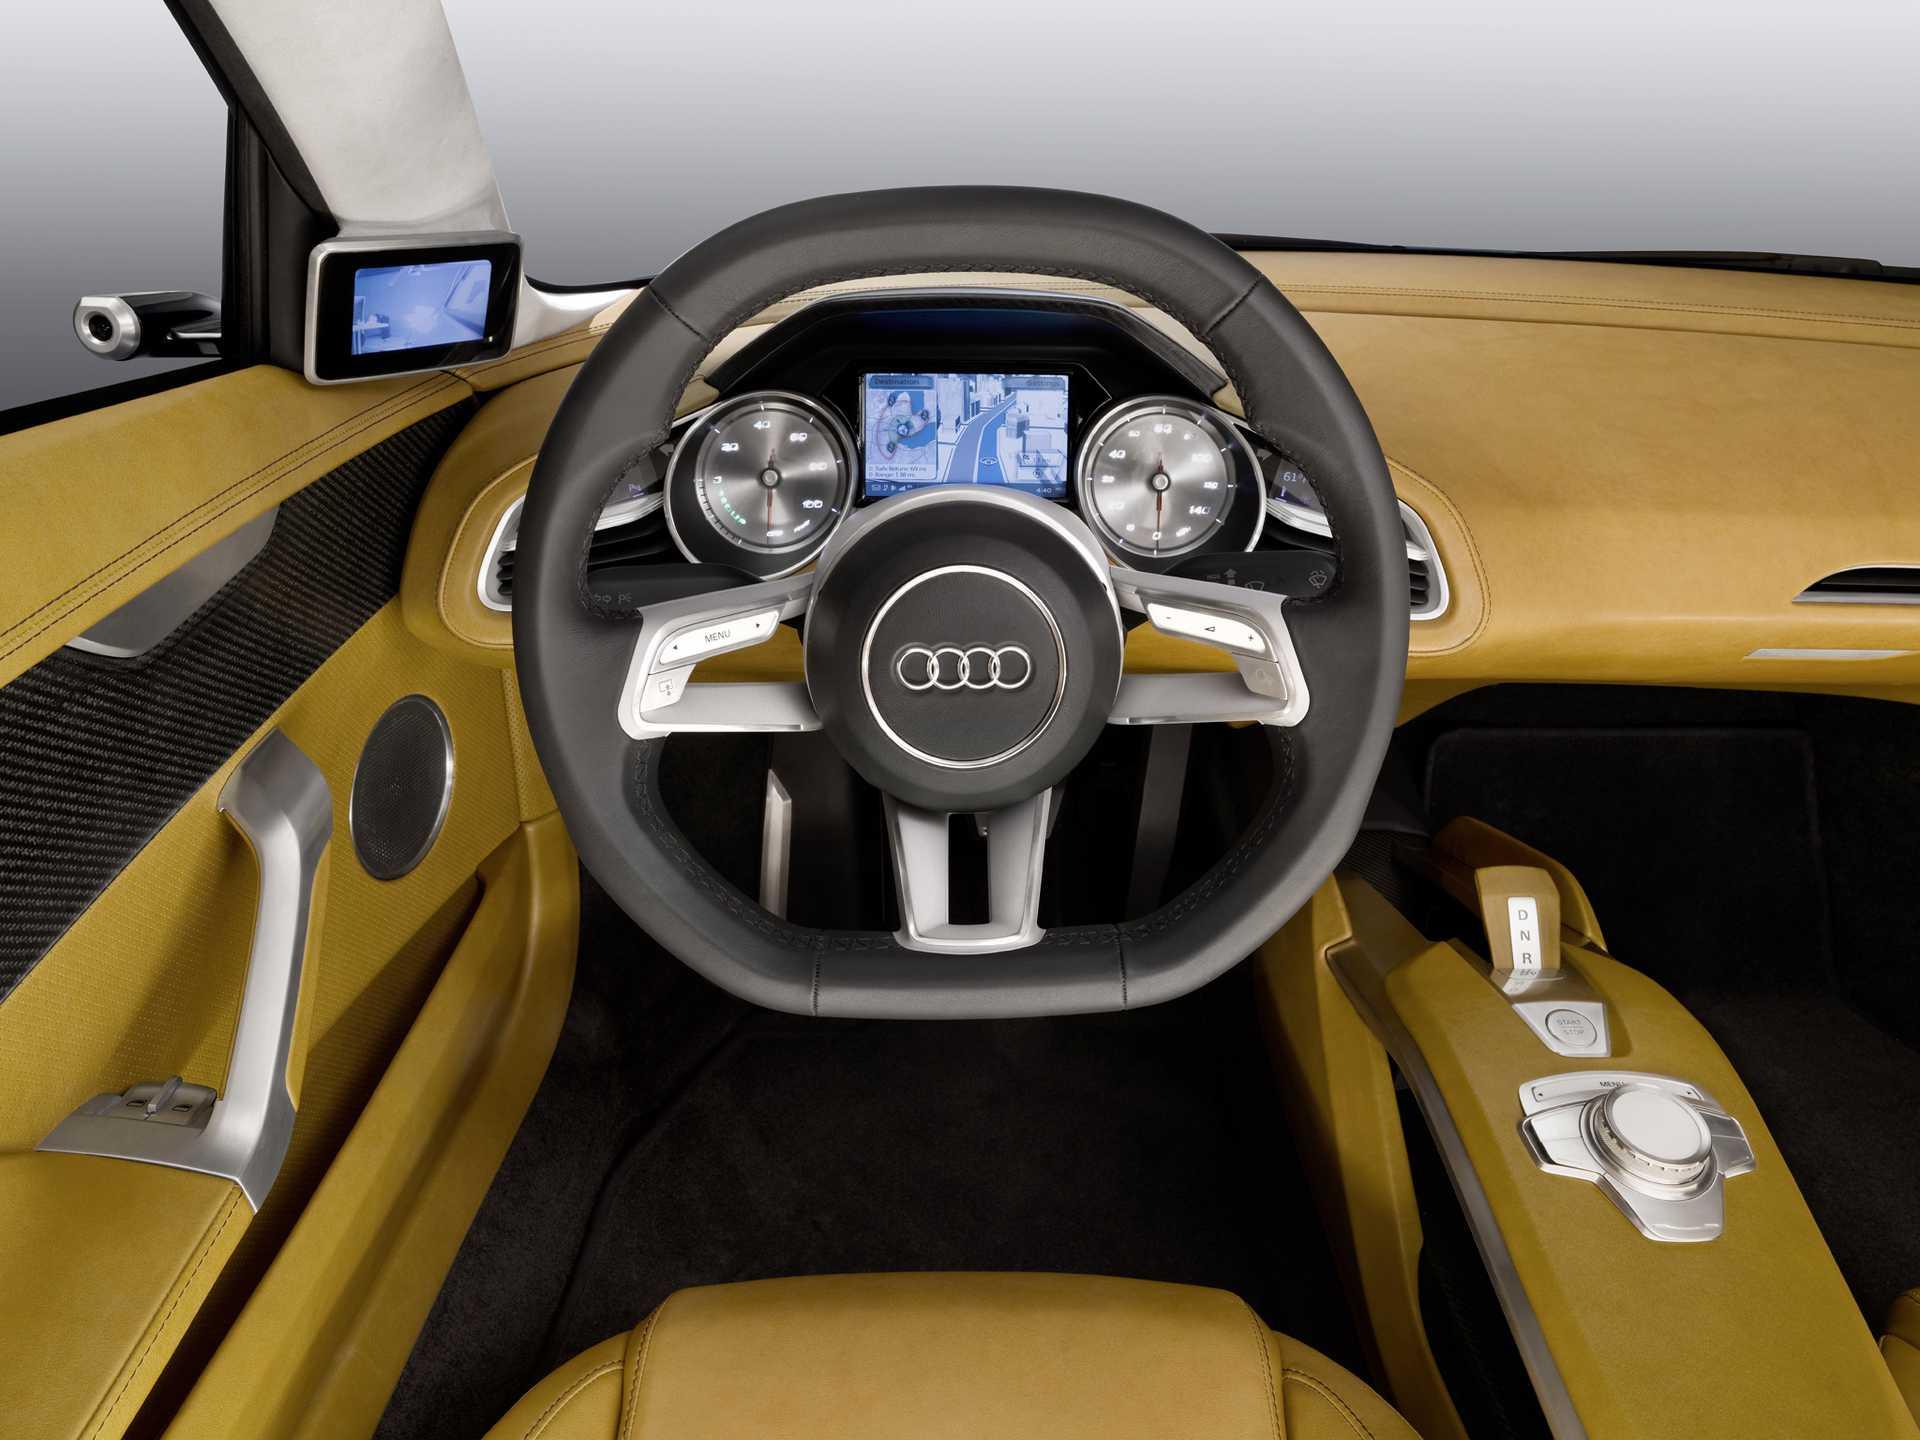 Audi e-Tron Detroit Showcar Electric Single Speed, 204hp, 2010